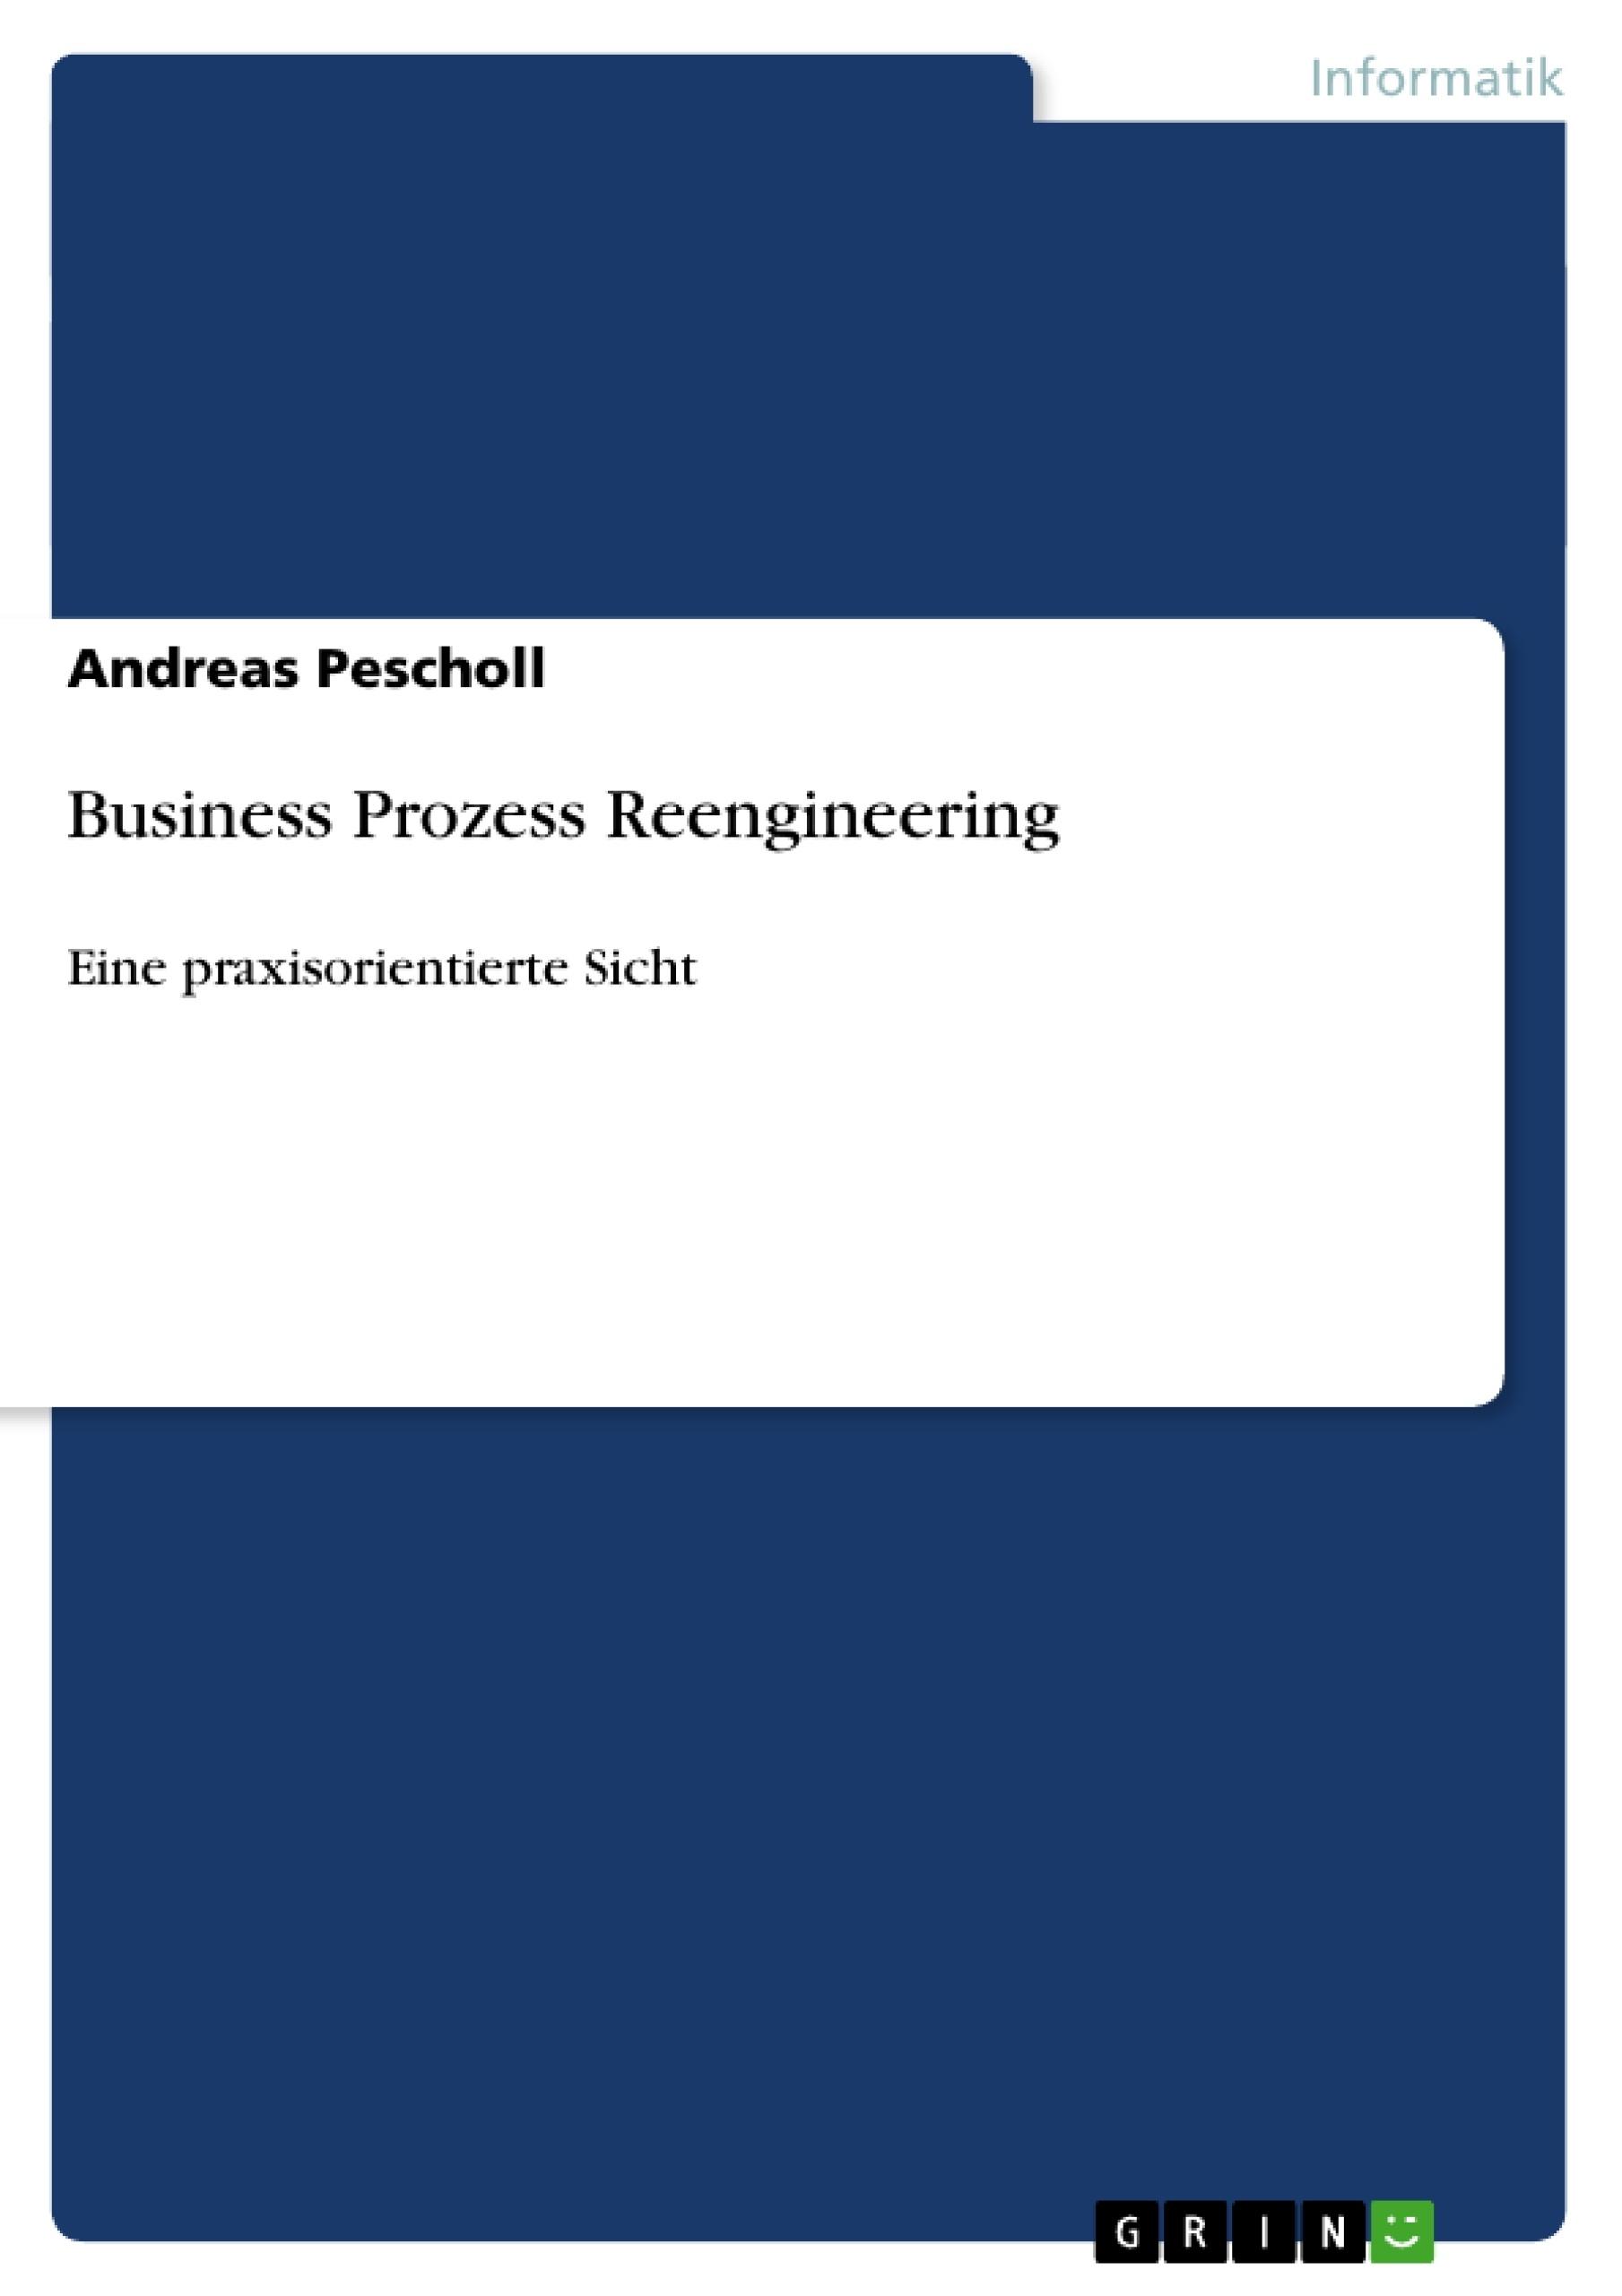 Titel: Business Prozess Reengineering